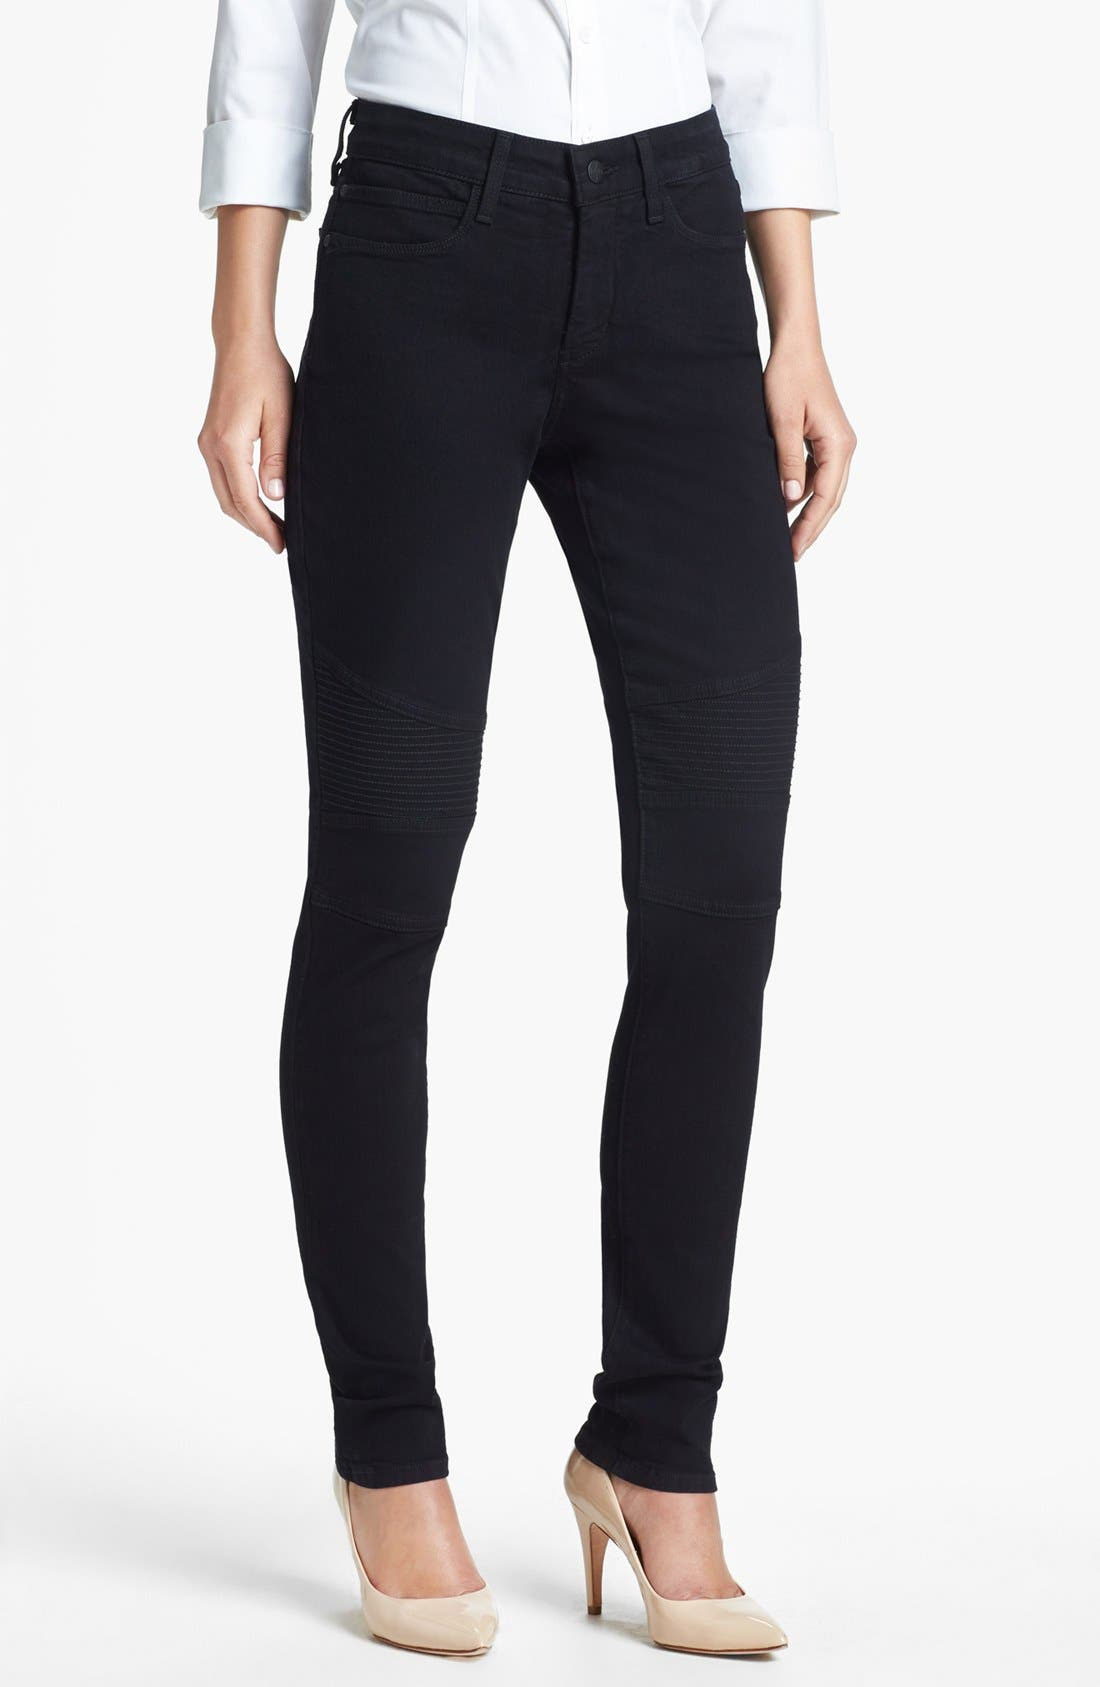 Main Image - NYDJ Gabriella' Stretch Moto Skinny Jeans (Black)